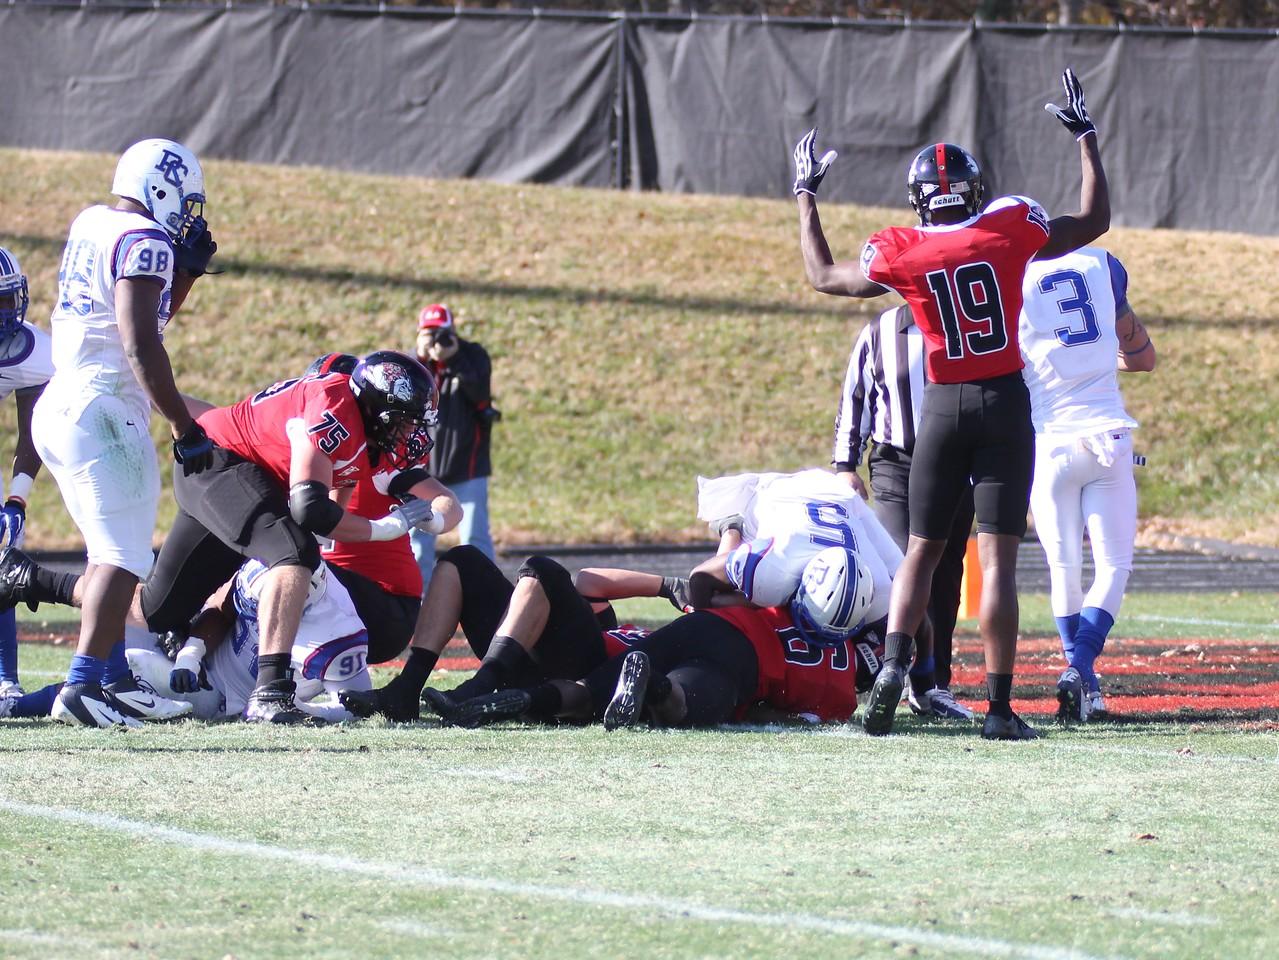 Gardner Webb's Kenny Little (6) makes a Touchdown for the Runnin' Bulldogs